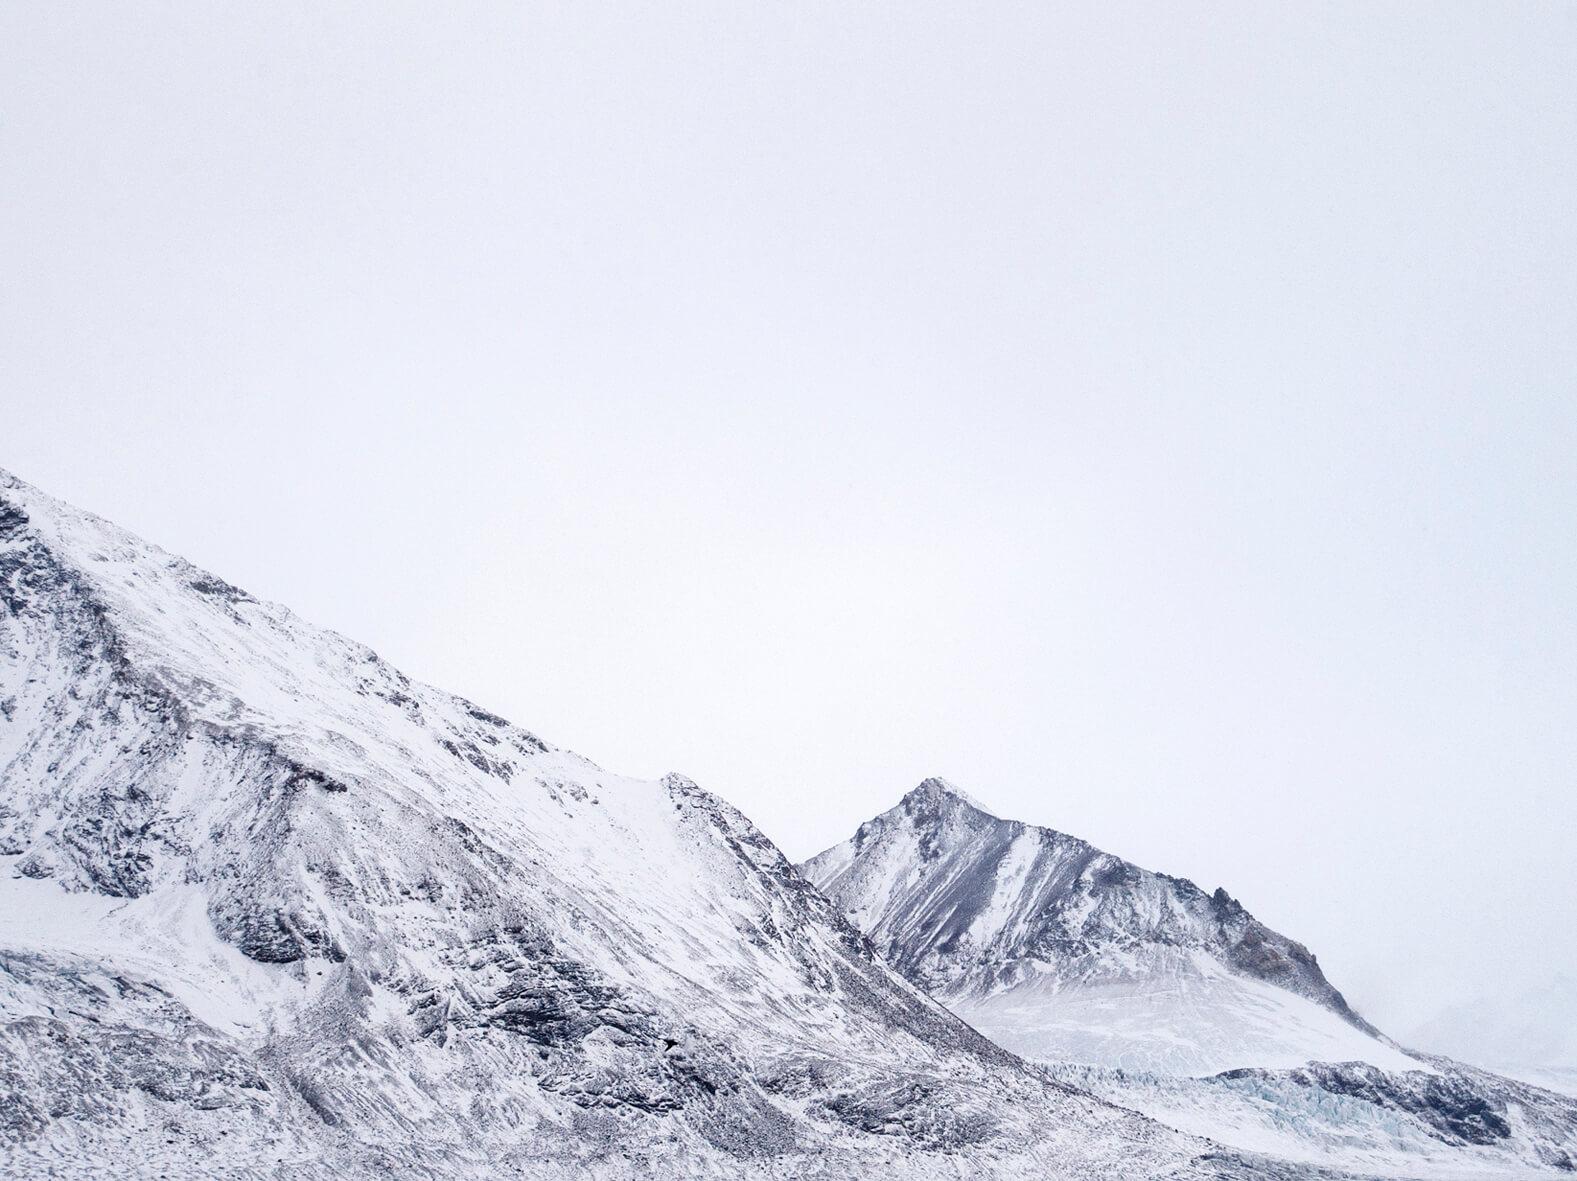 high arctic mountain landscape